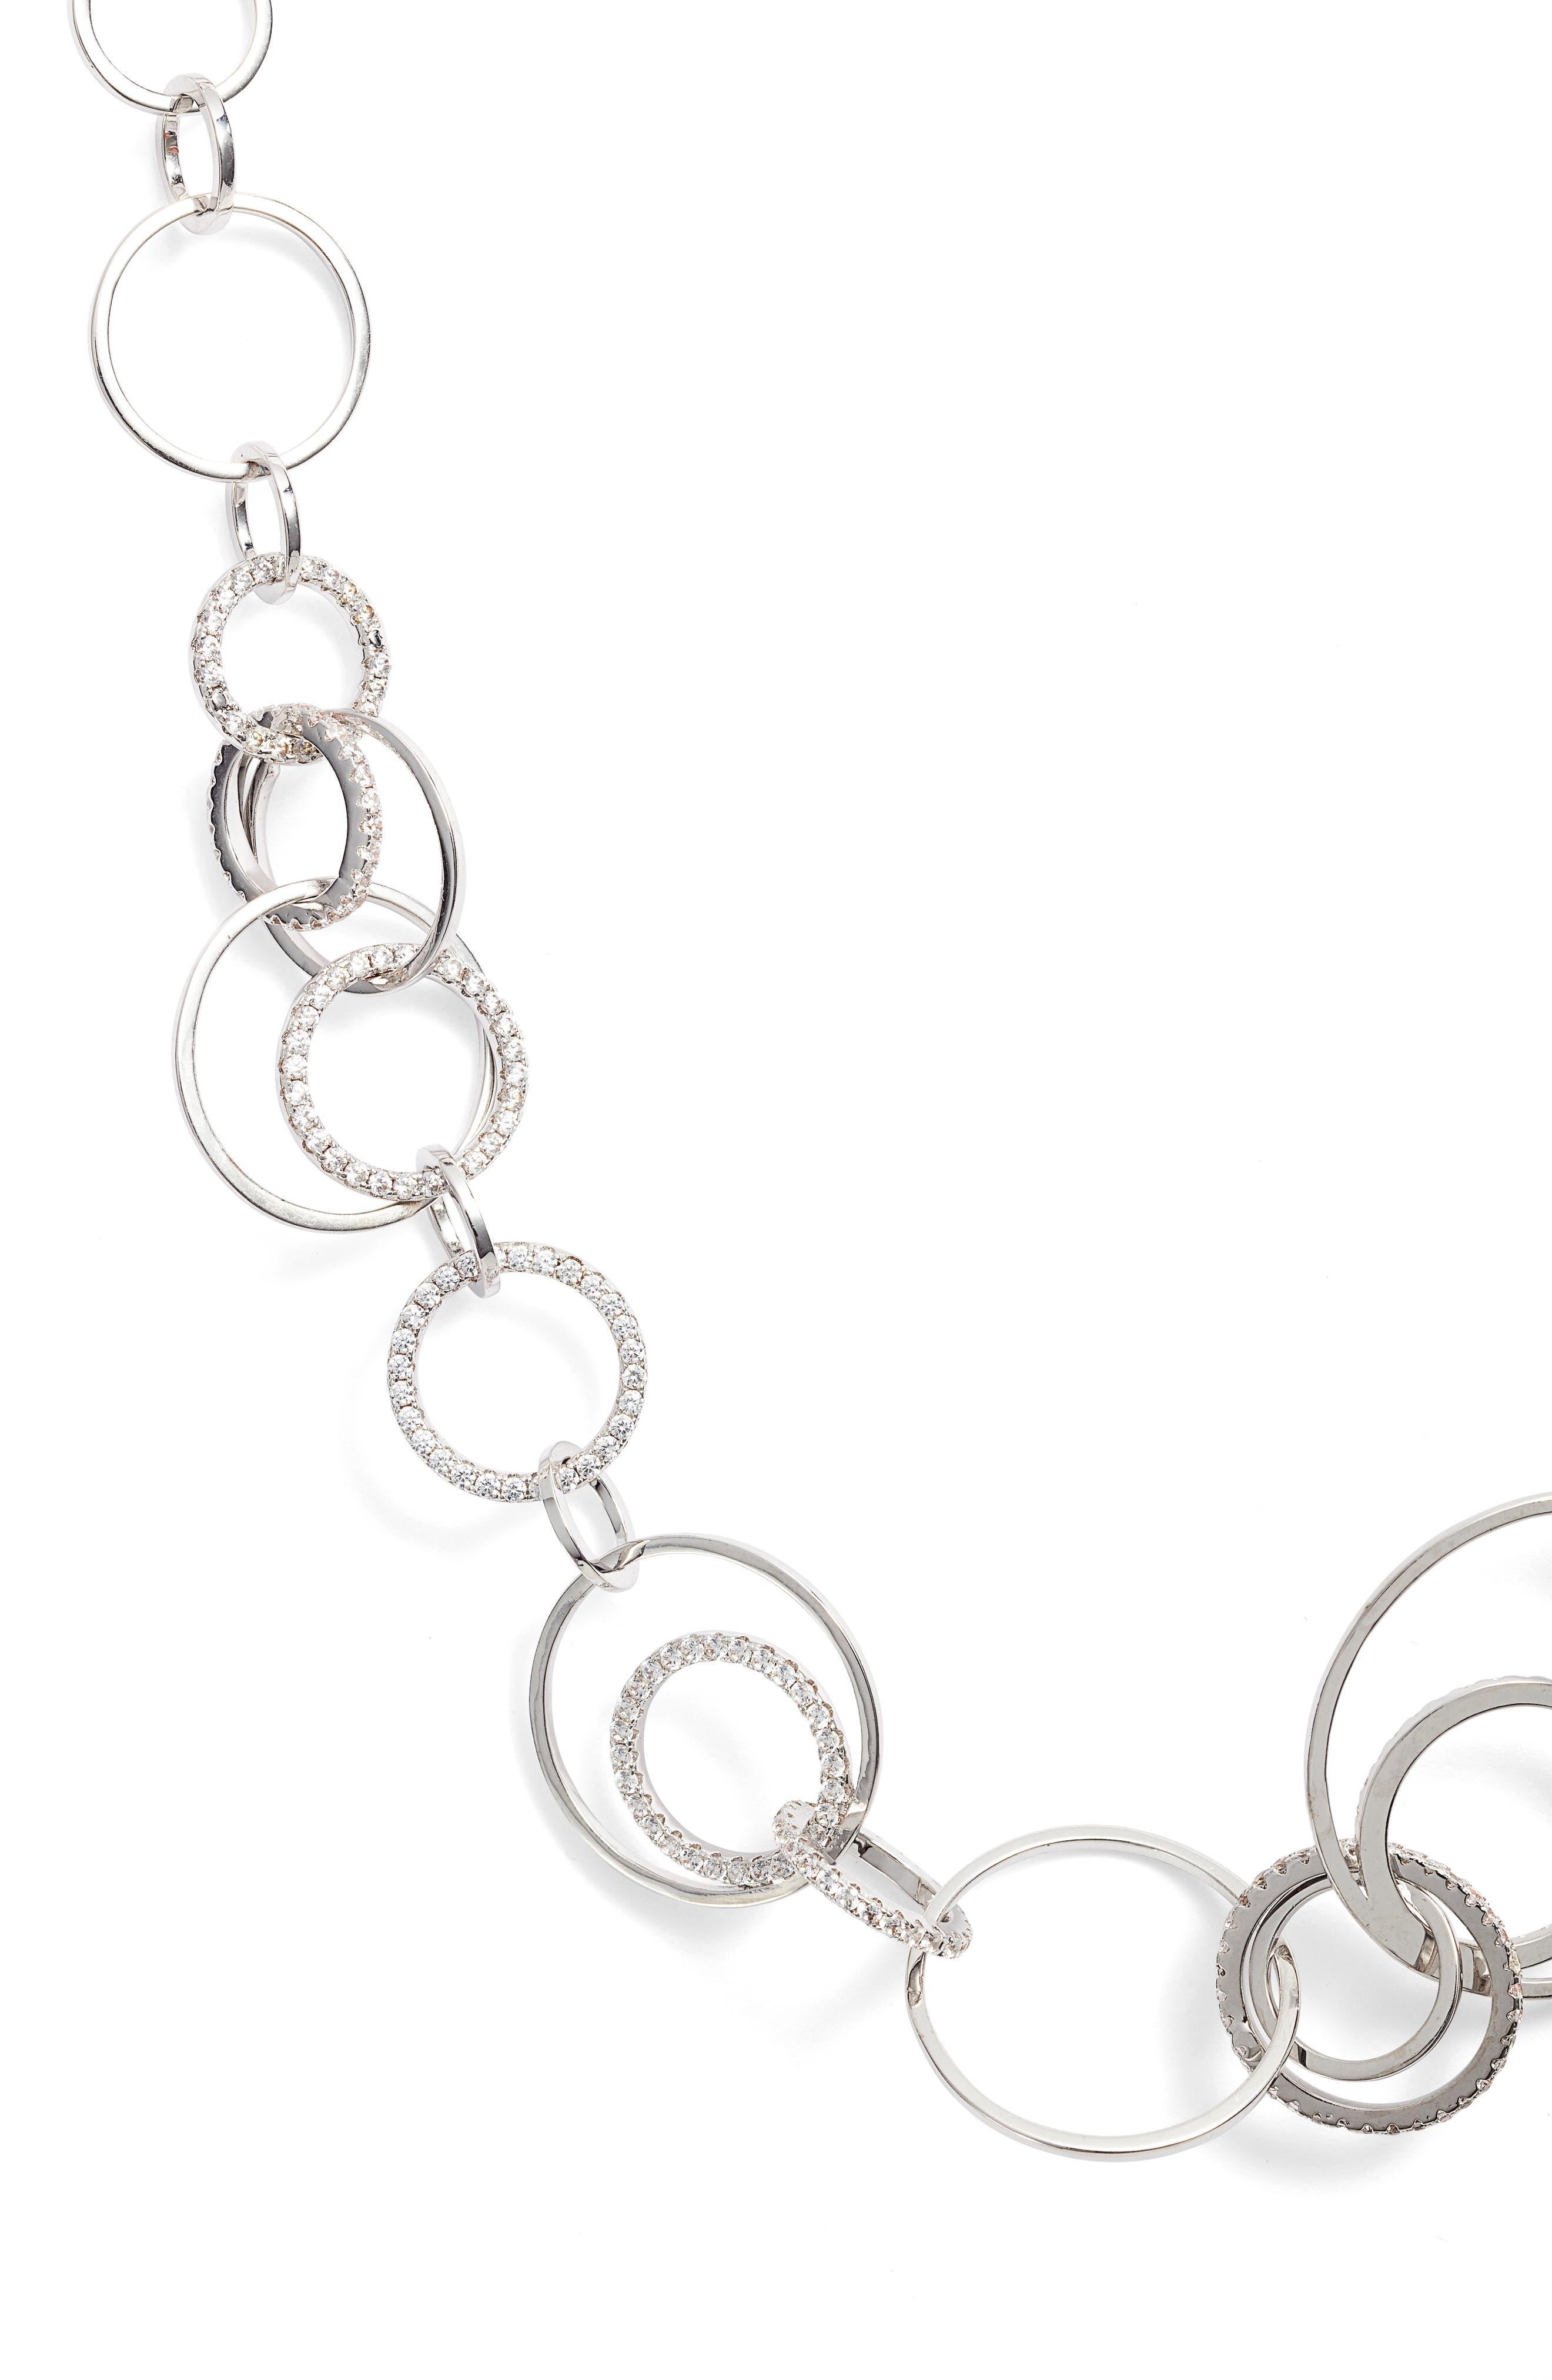 Sarah Cubic Zirconia Collar Necklace,                         Main,                         color, 041